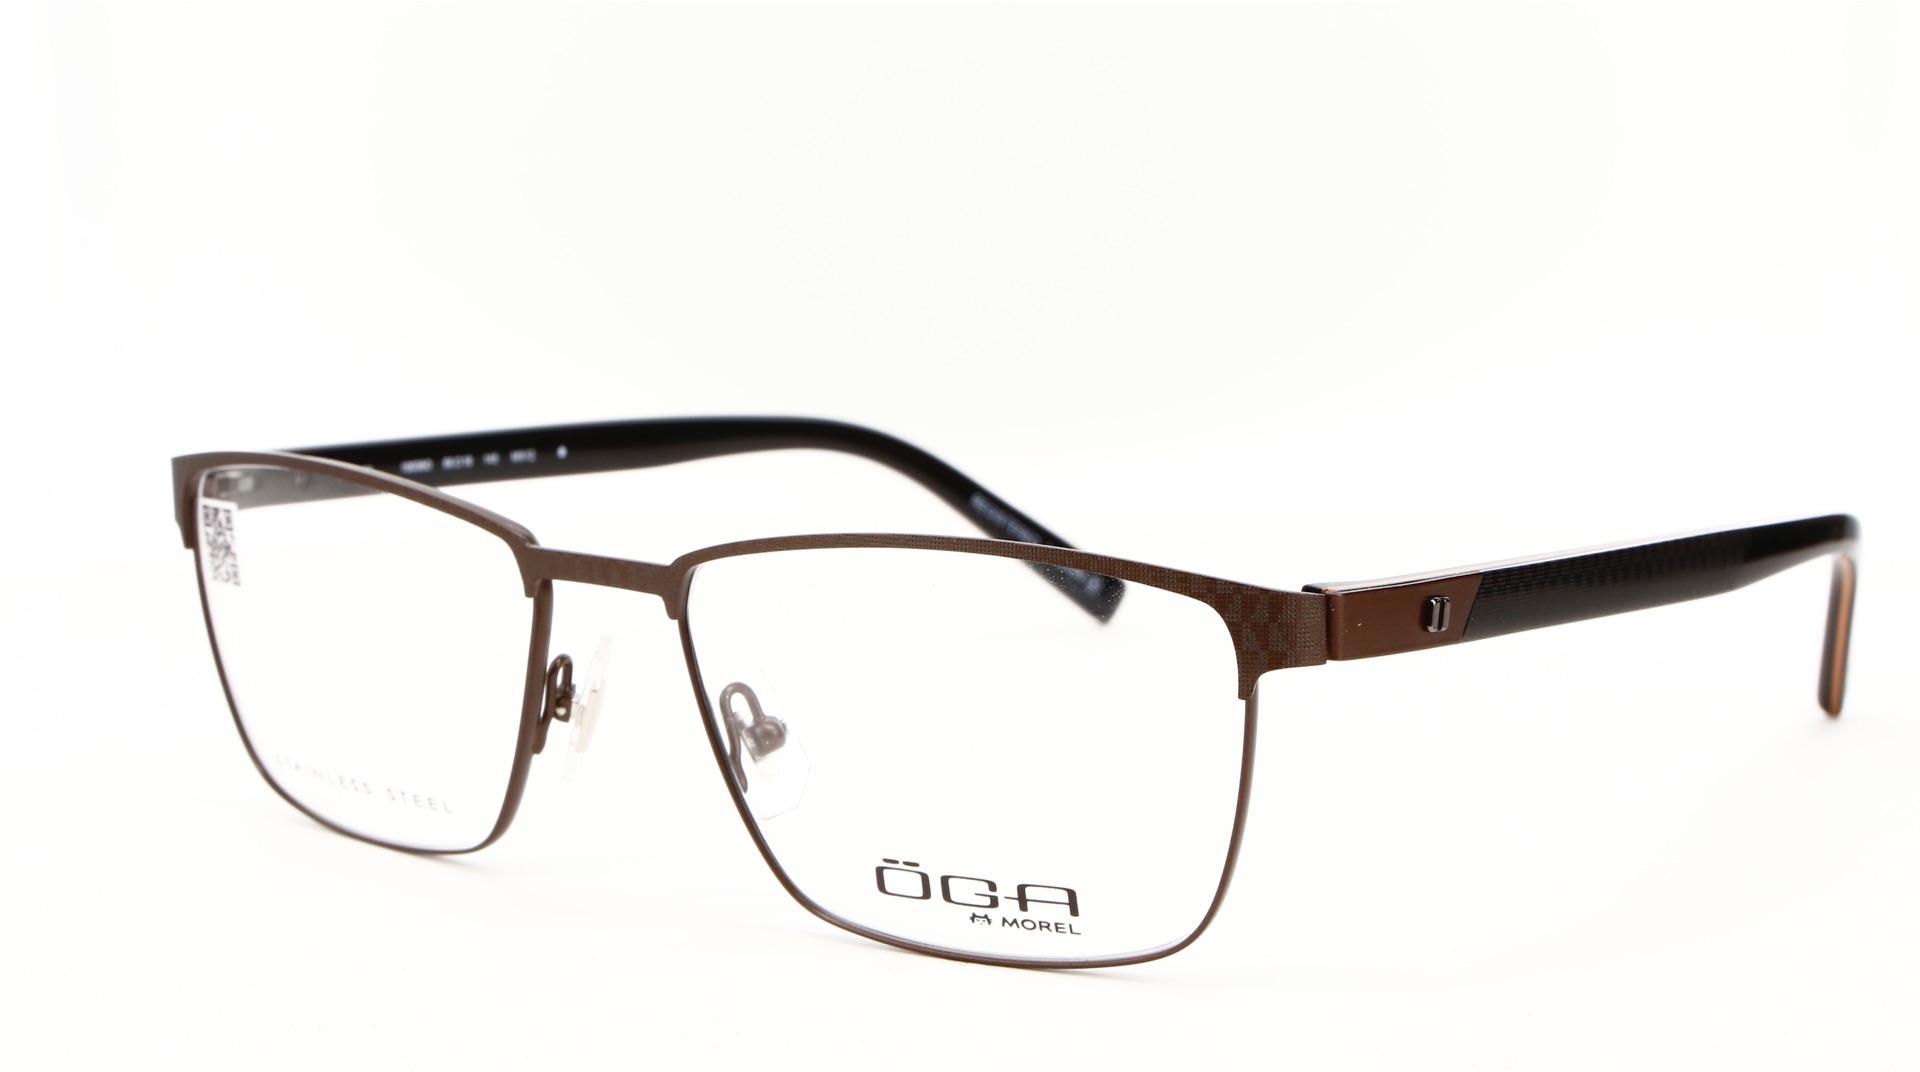 OGA - ref: 78960